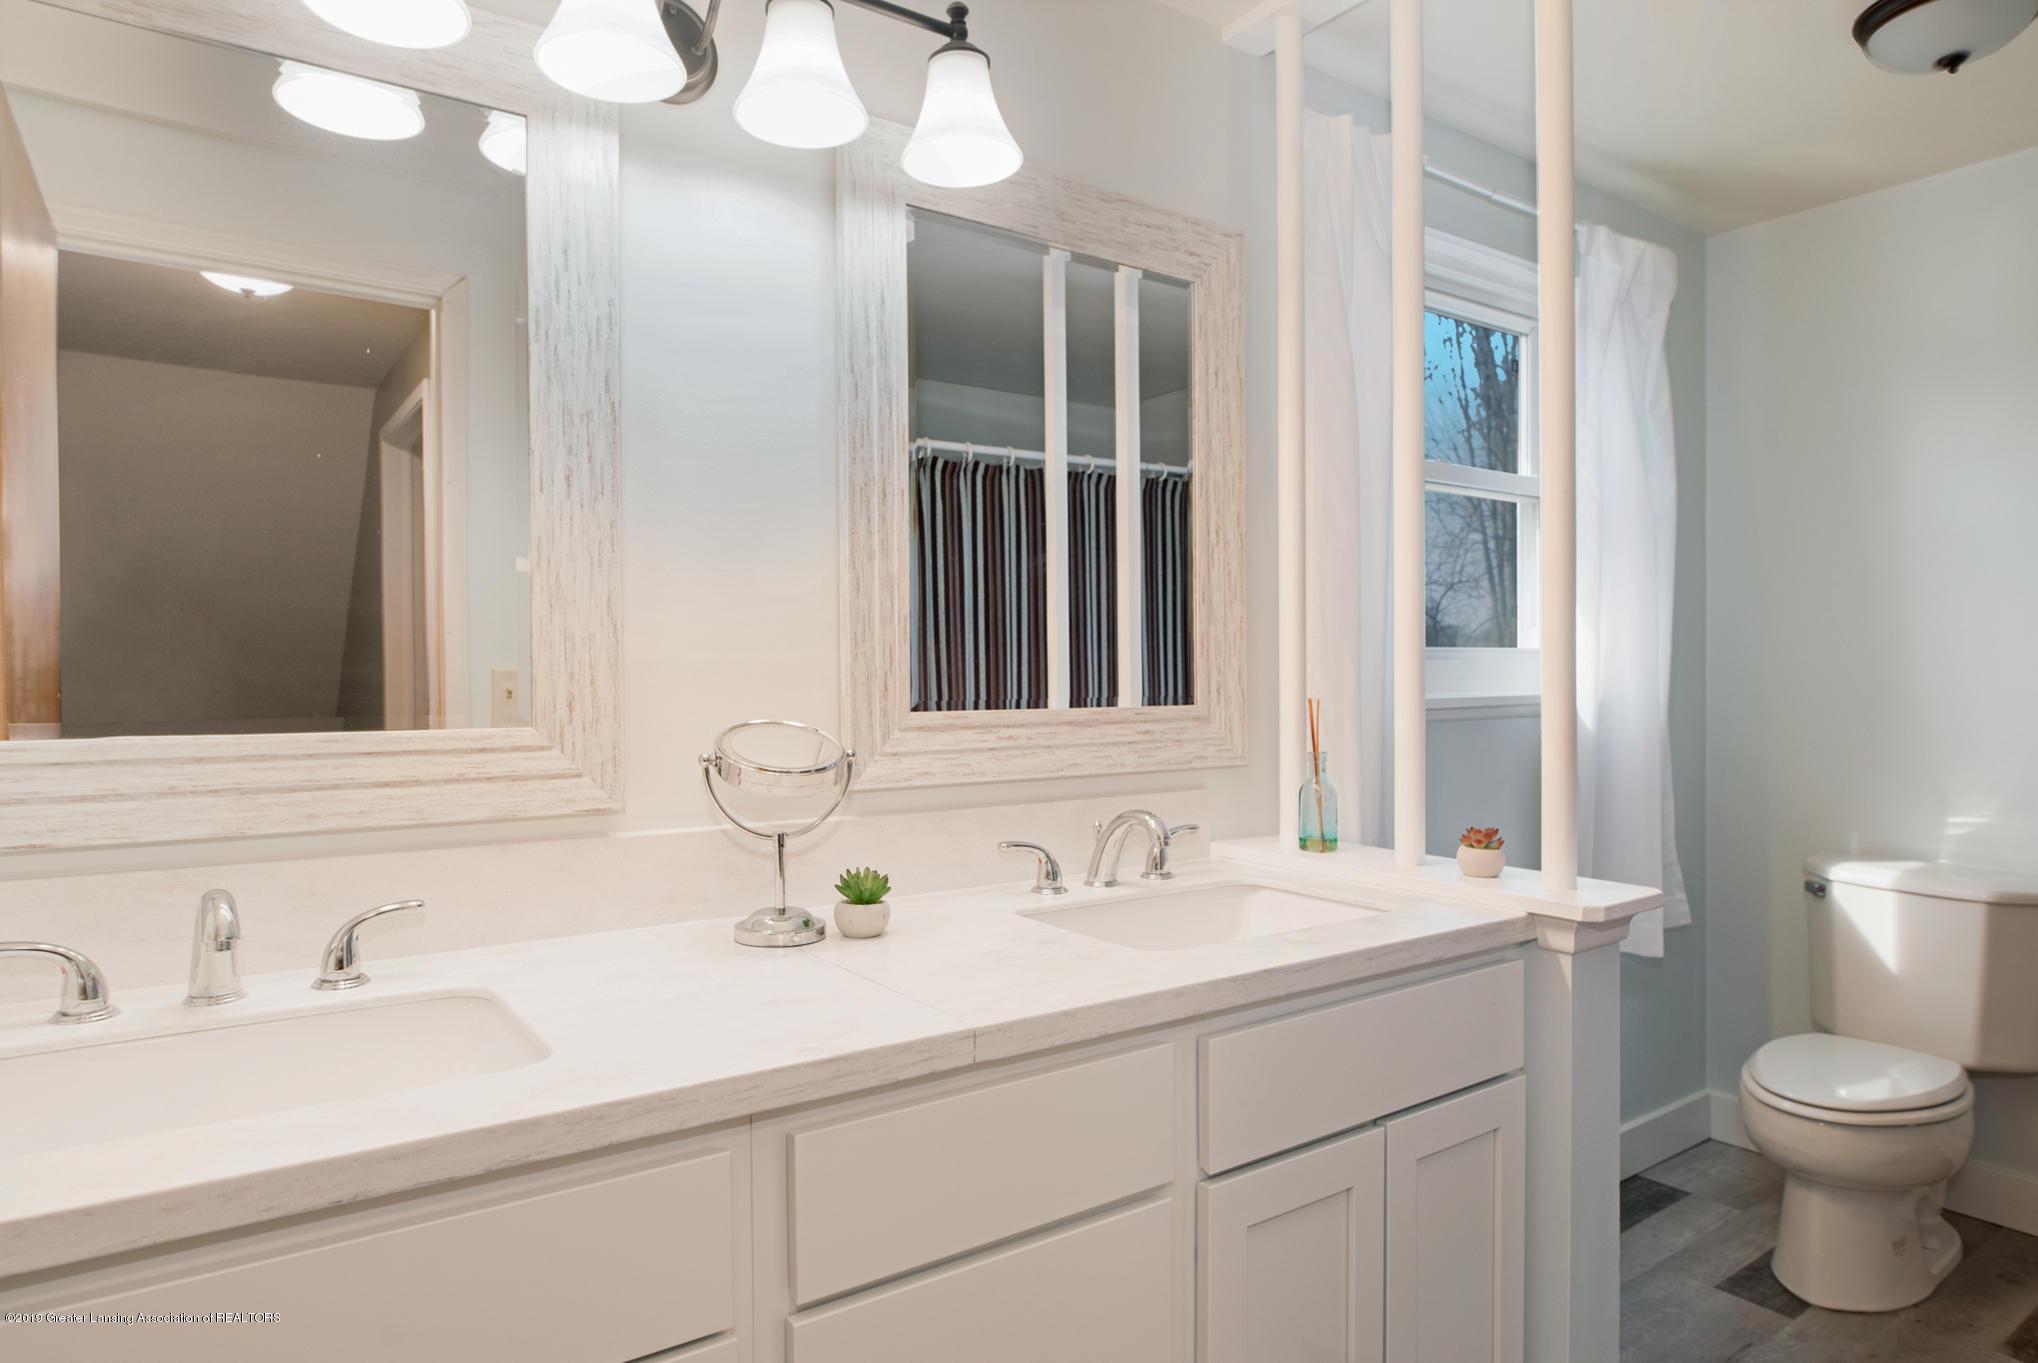 981 Ramblewood Dr - Full bathroom - 27